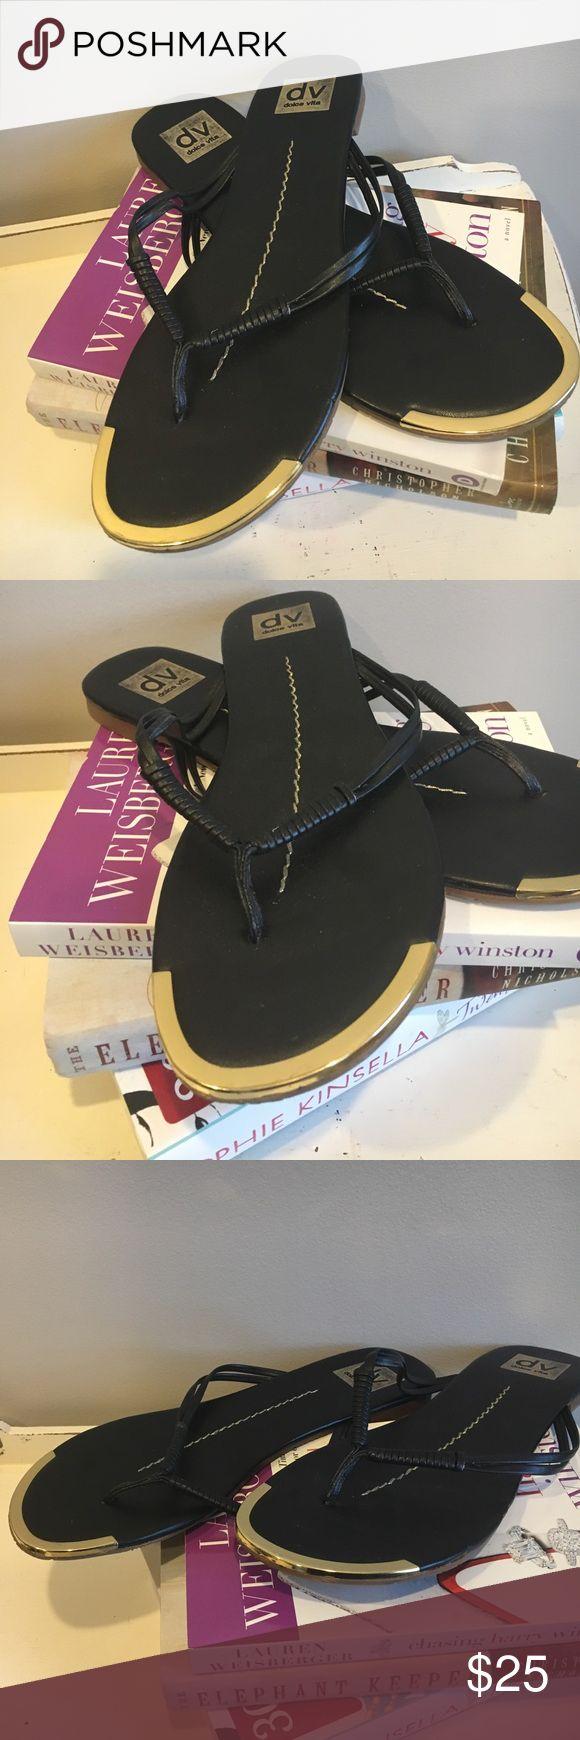 17 Best ideas about Black Flip Flops on Pinterest | Rainbow sandals, Black shirt outfits and ...